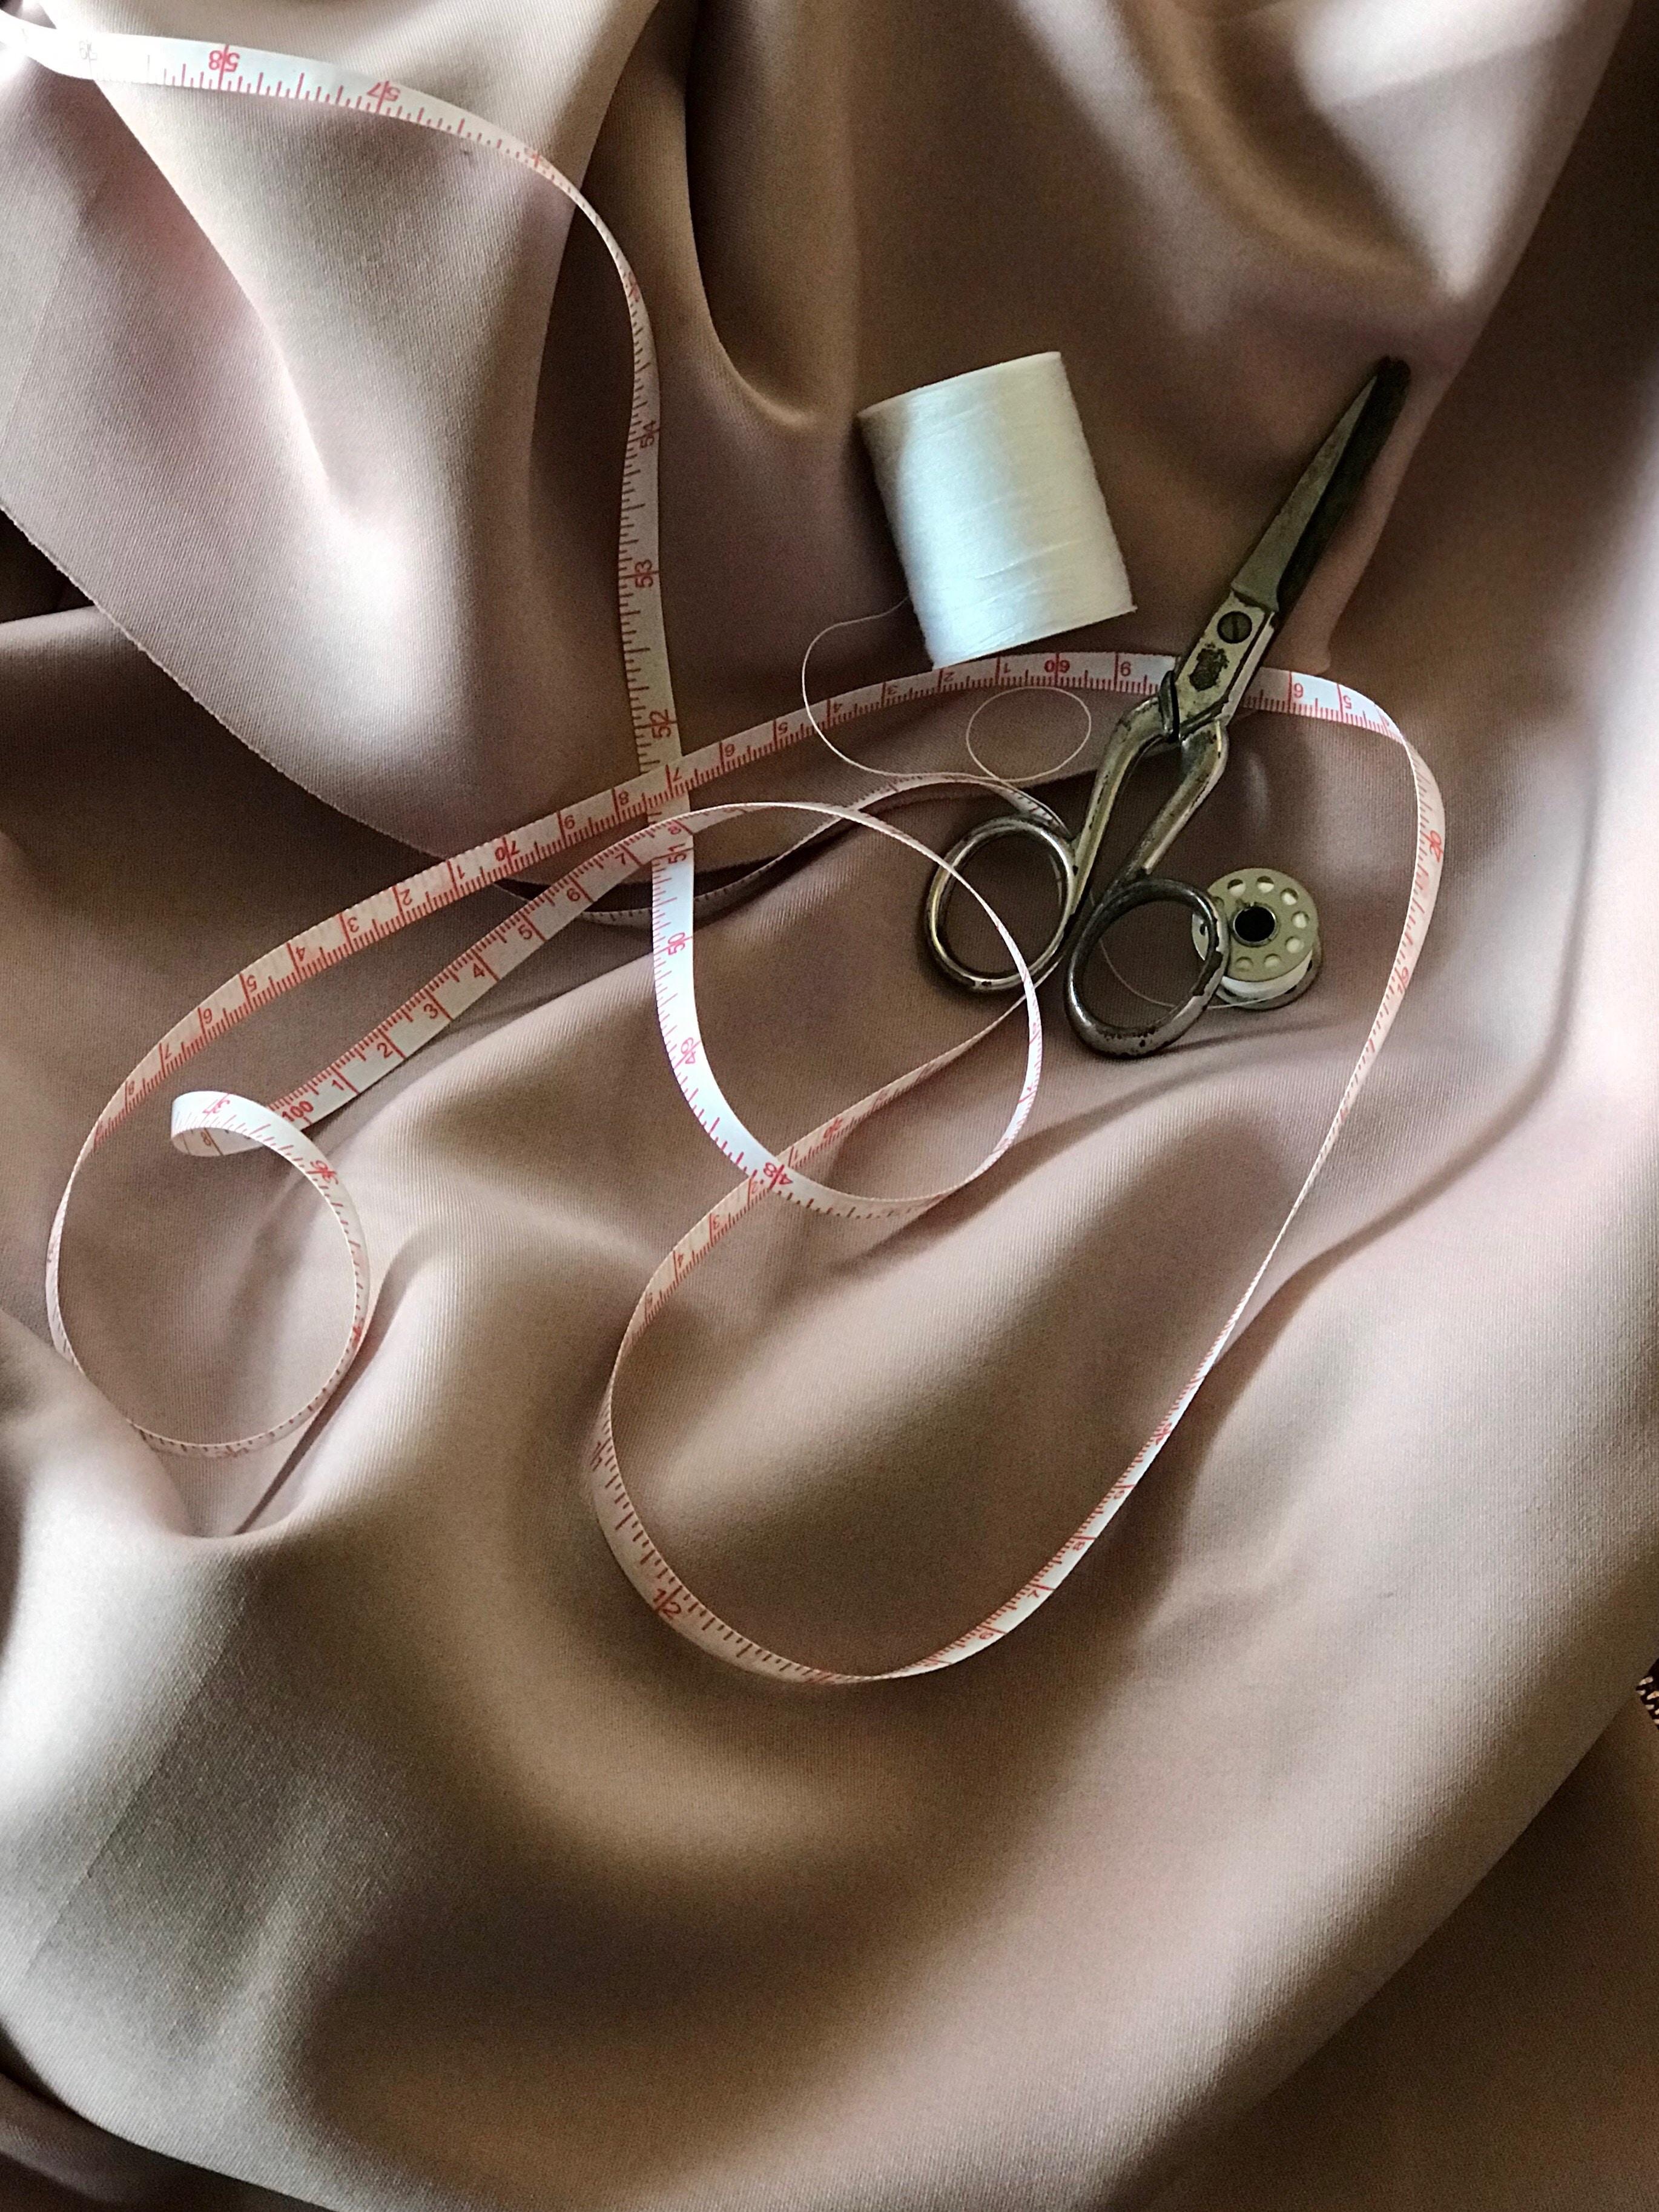 white tape measure and gray scissors